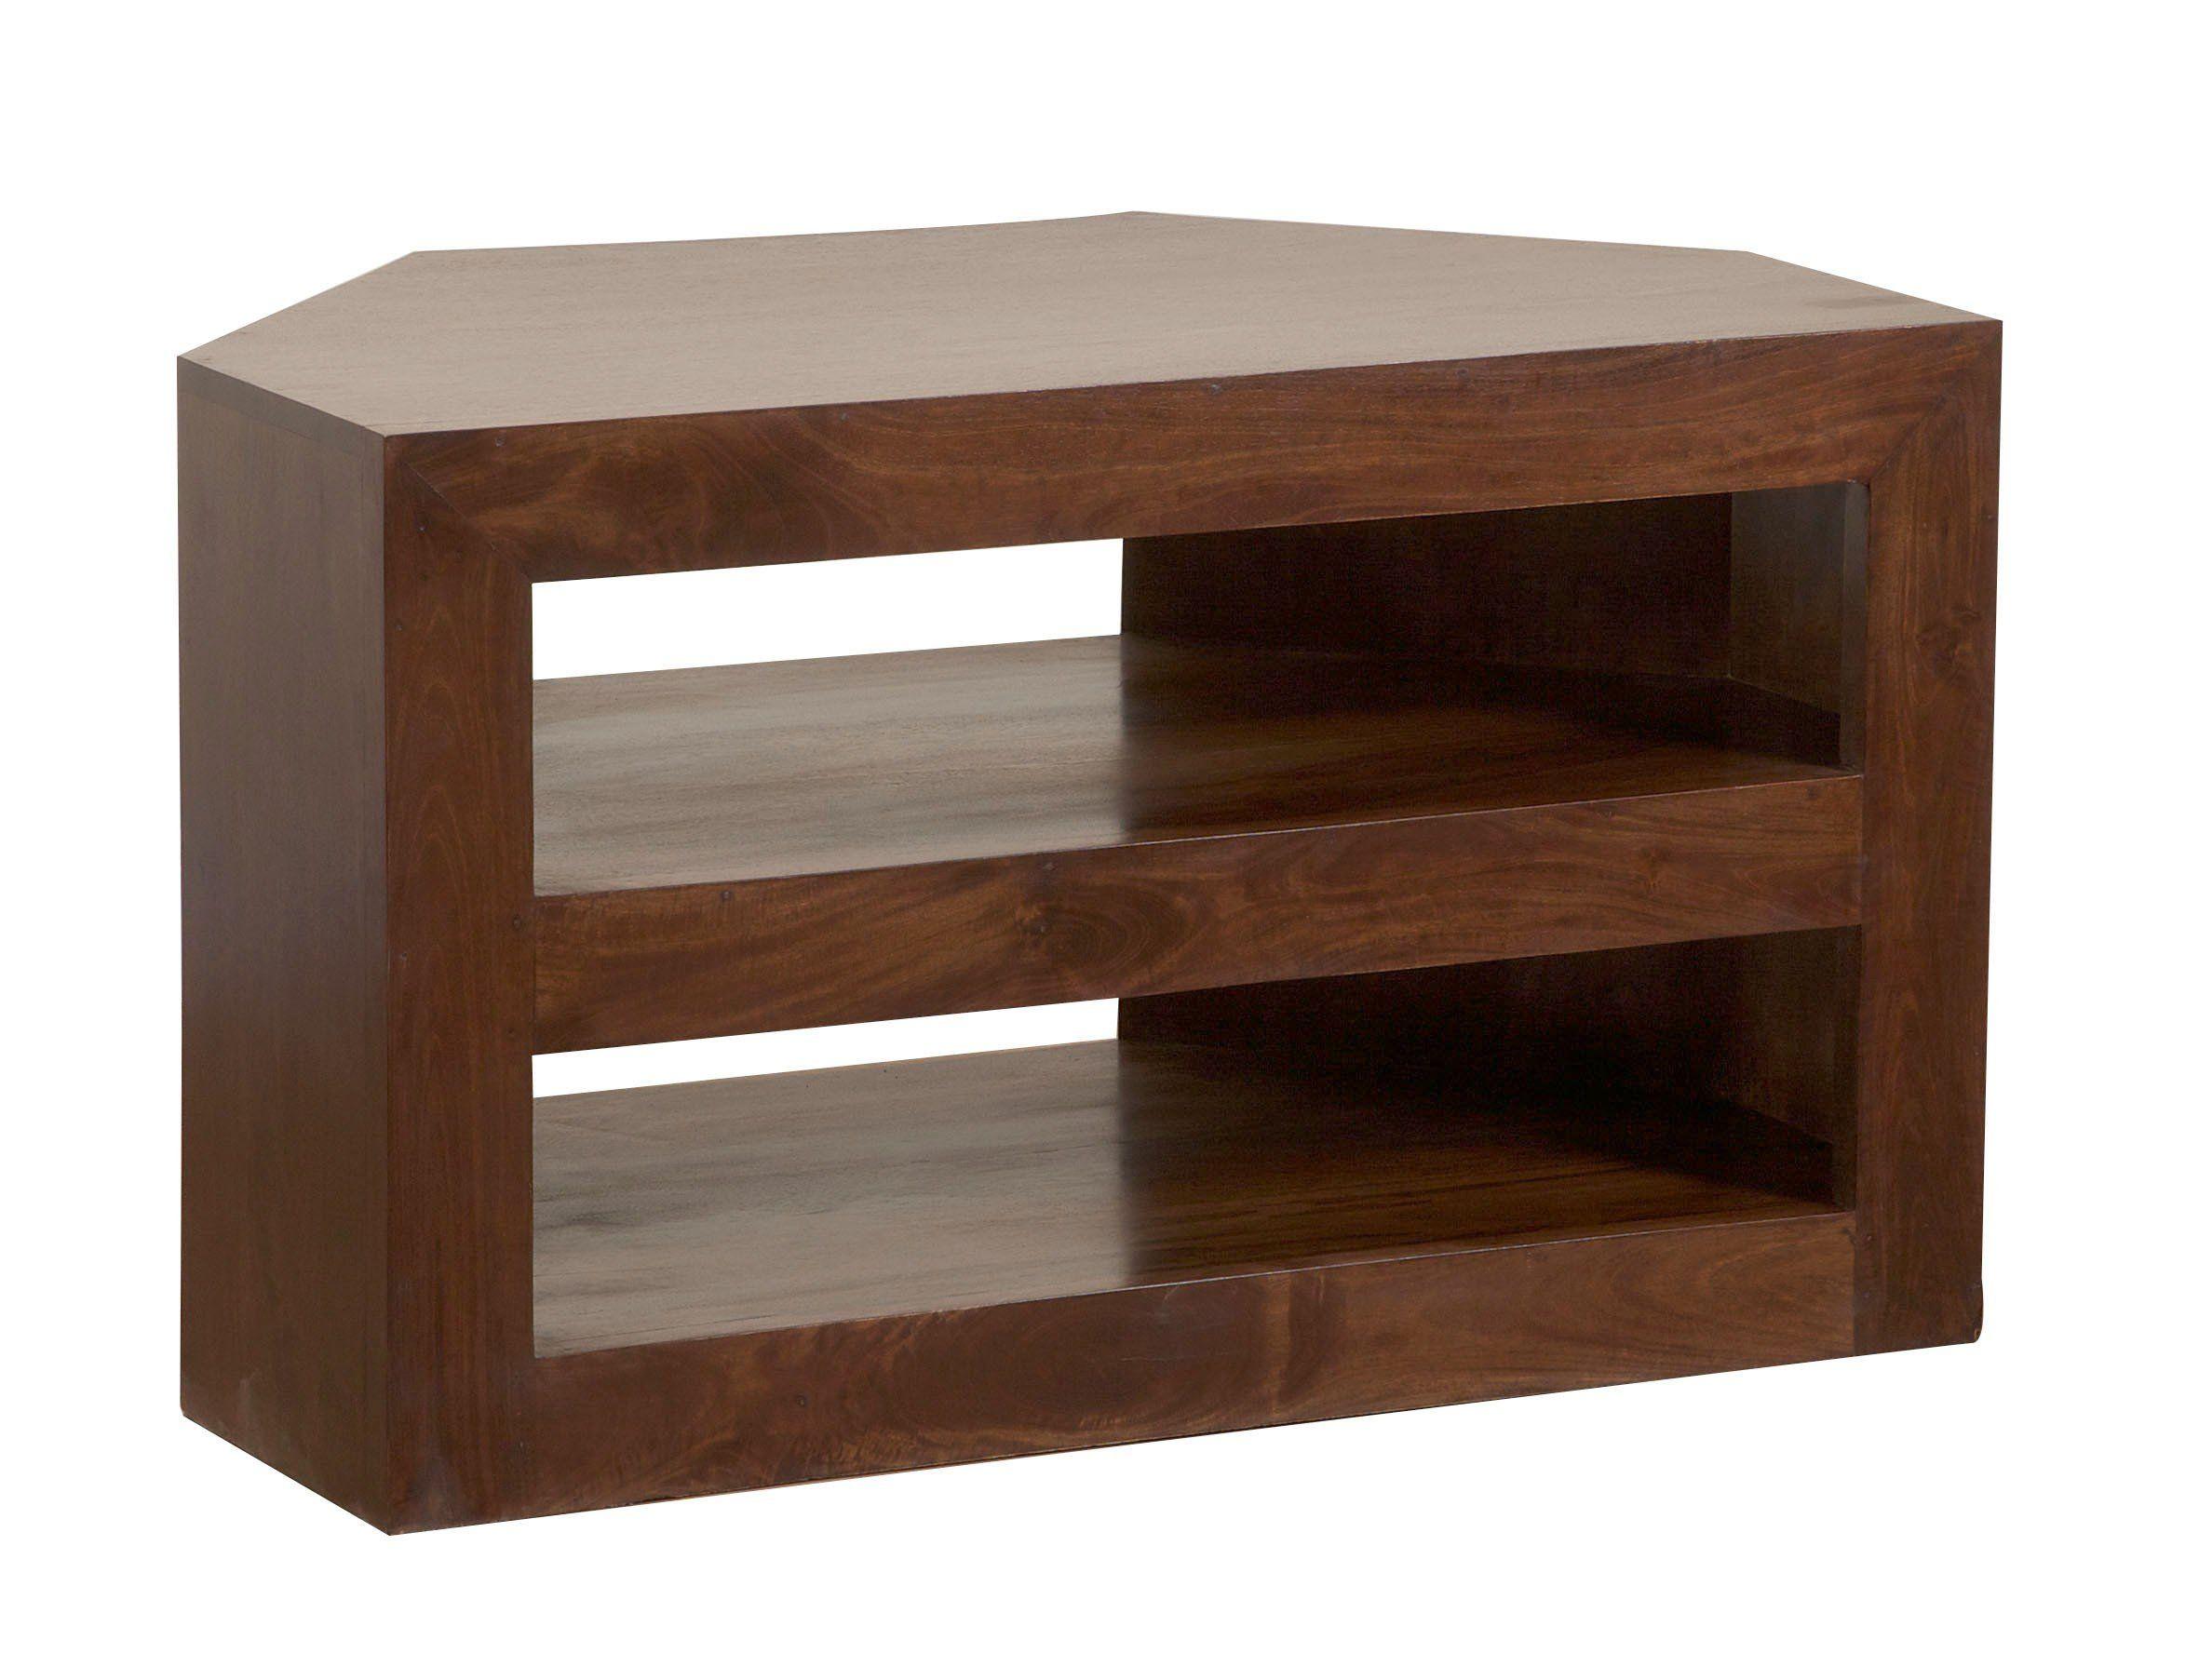 Homescapes Dakota Tv Dvd Corner Unit For Living Room Dark Shade Solid Mango Wood Furniture No Veneer Wood Shelves Kitchen Wood Shelves Mango Wood Furniture [ 1805 x 2362 Pixel ]